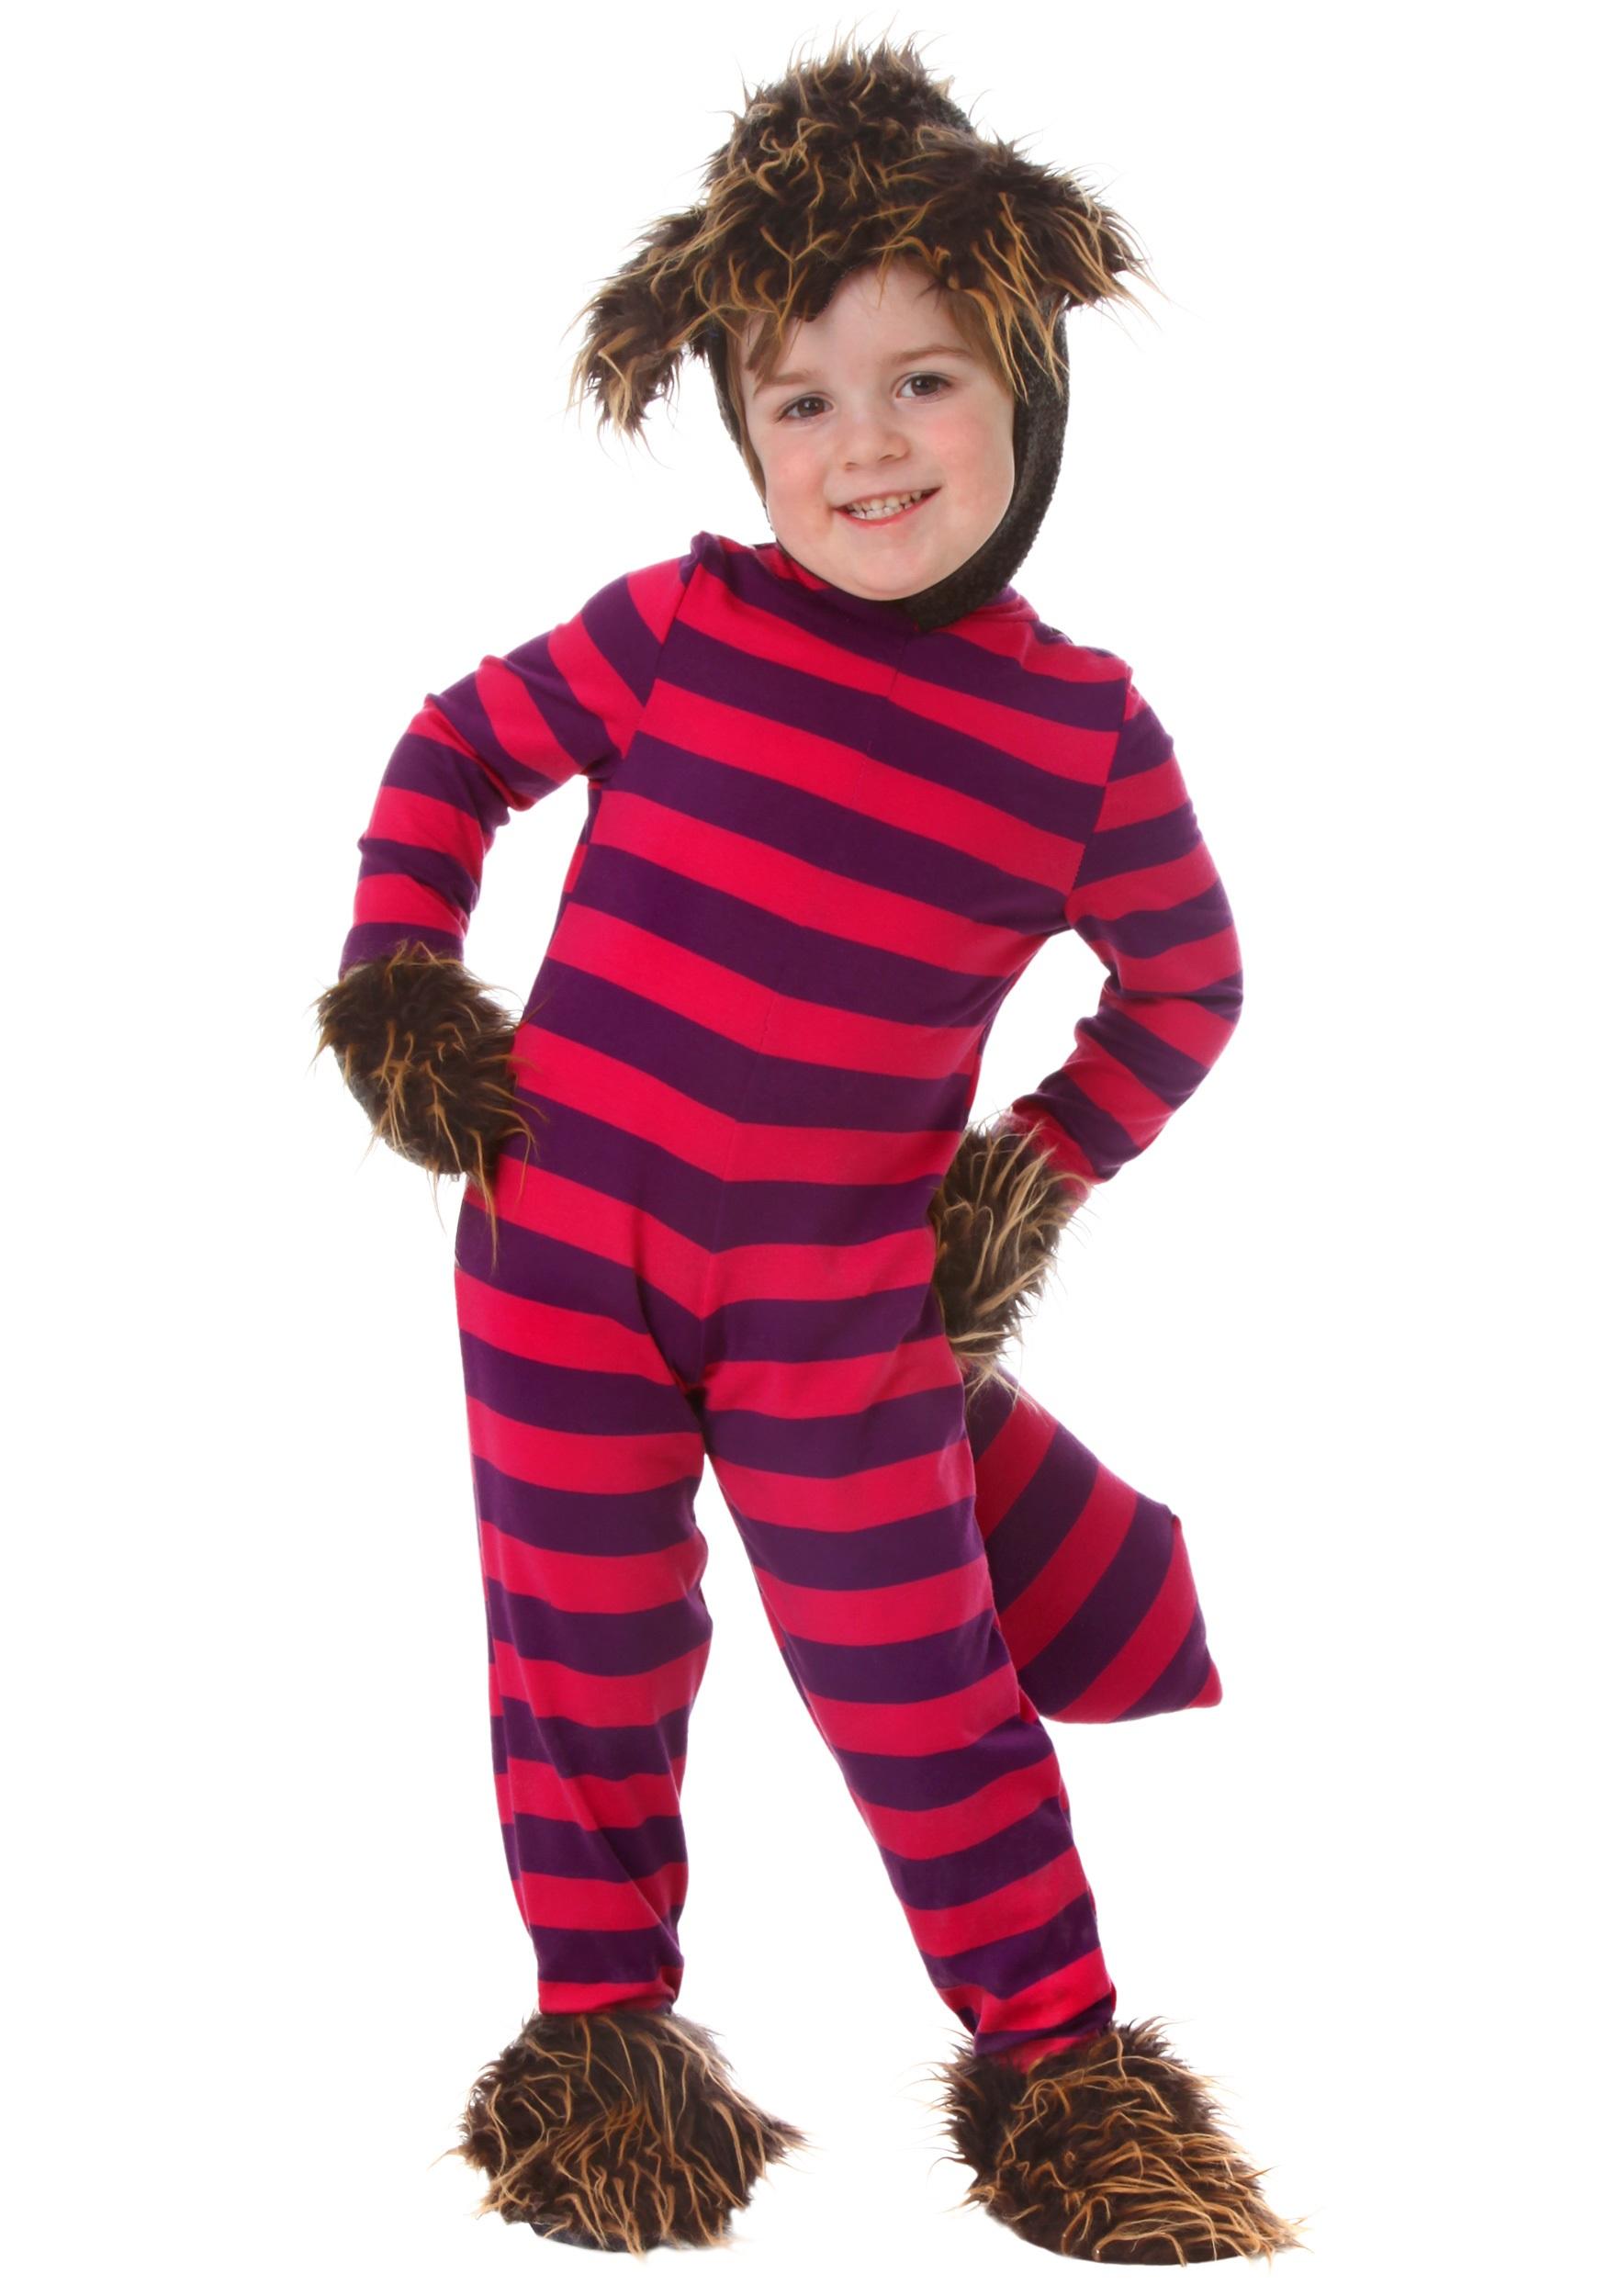 Cheshire Cat Toddler Costume  sc 1 st  Halloween Costume & Cheshire Cat Toddler Costume - Kids Wonderland Cat Costumes